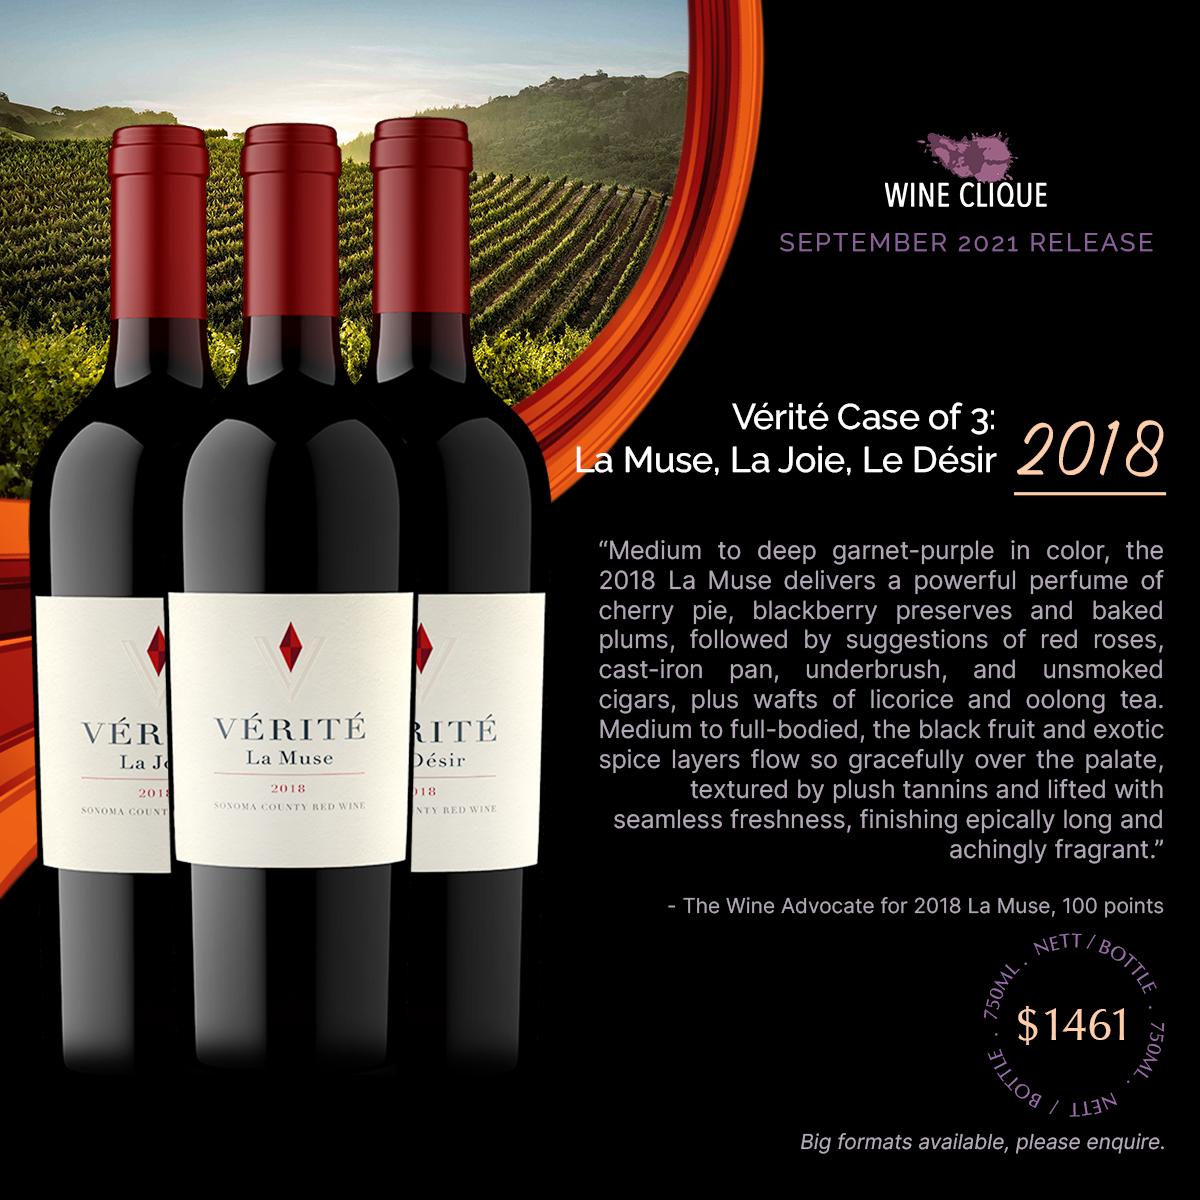 September 2021 Release: Château de Beaucastel, L'Aventure